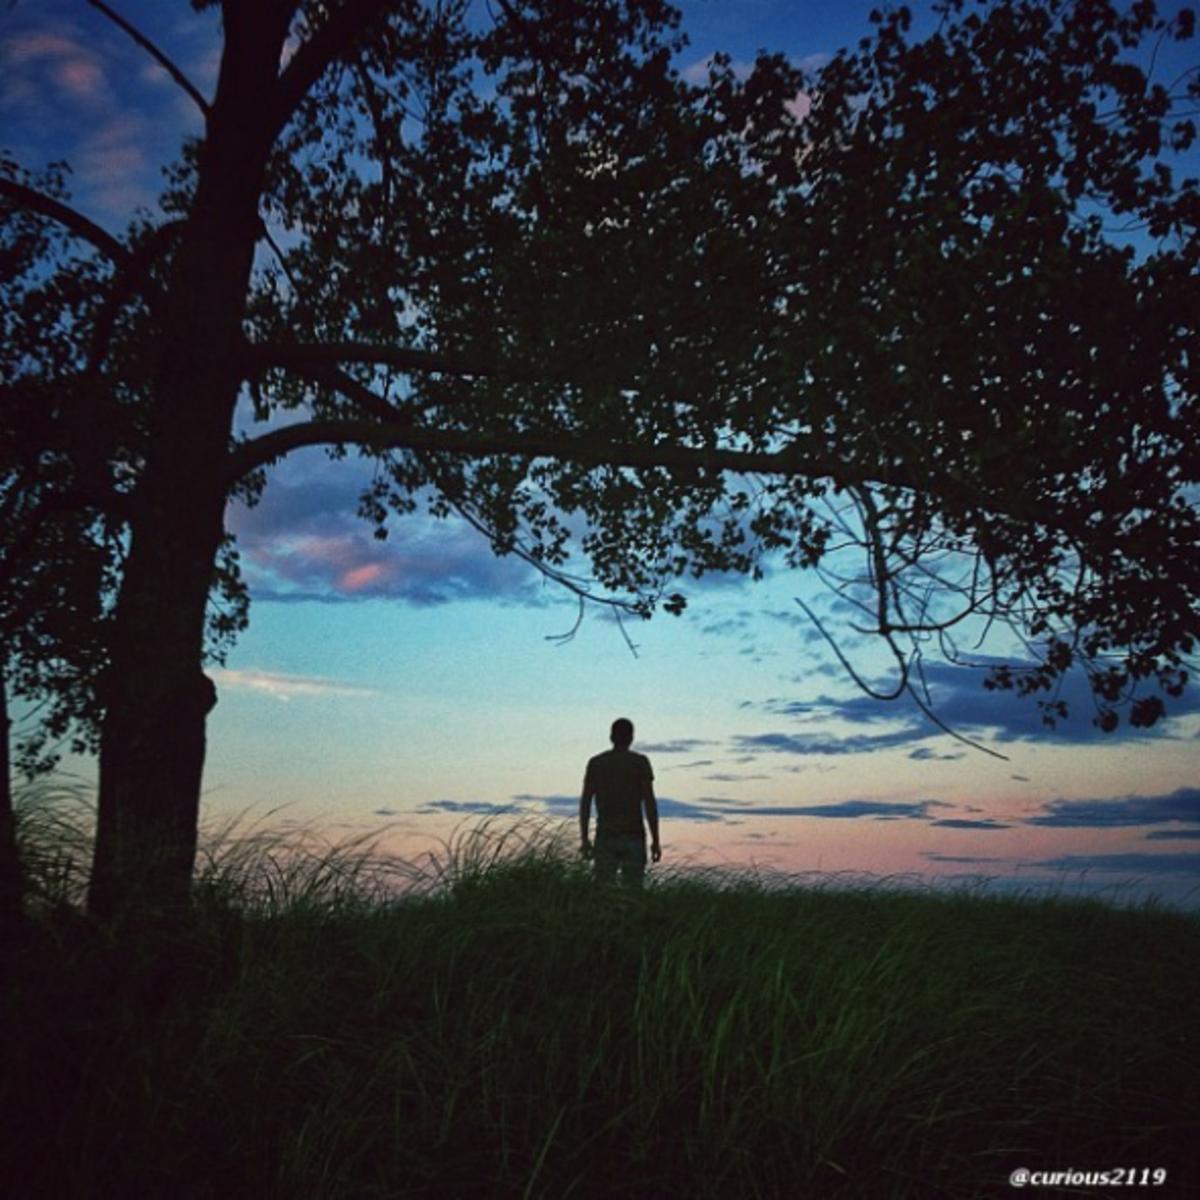 curious2119 instagram photographer